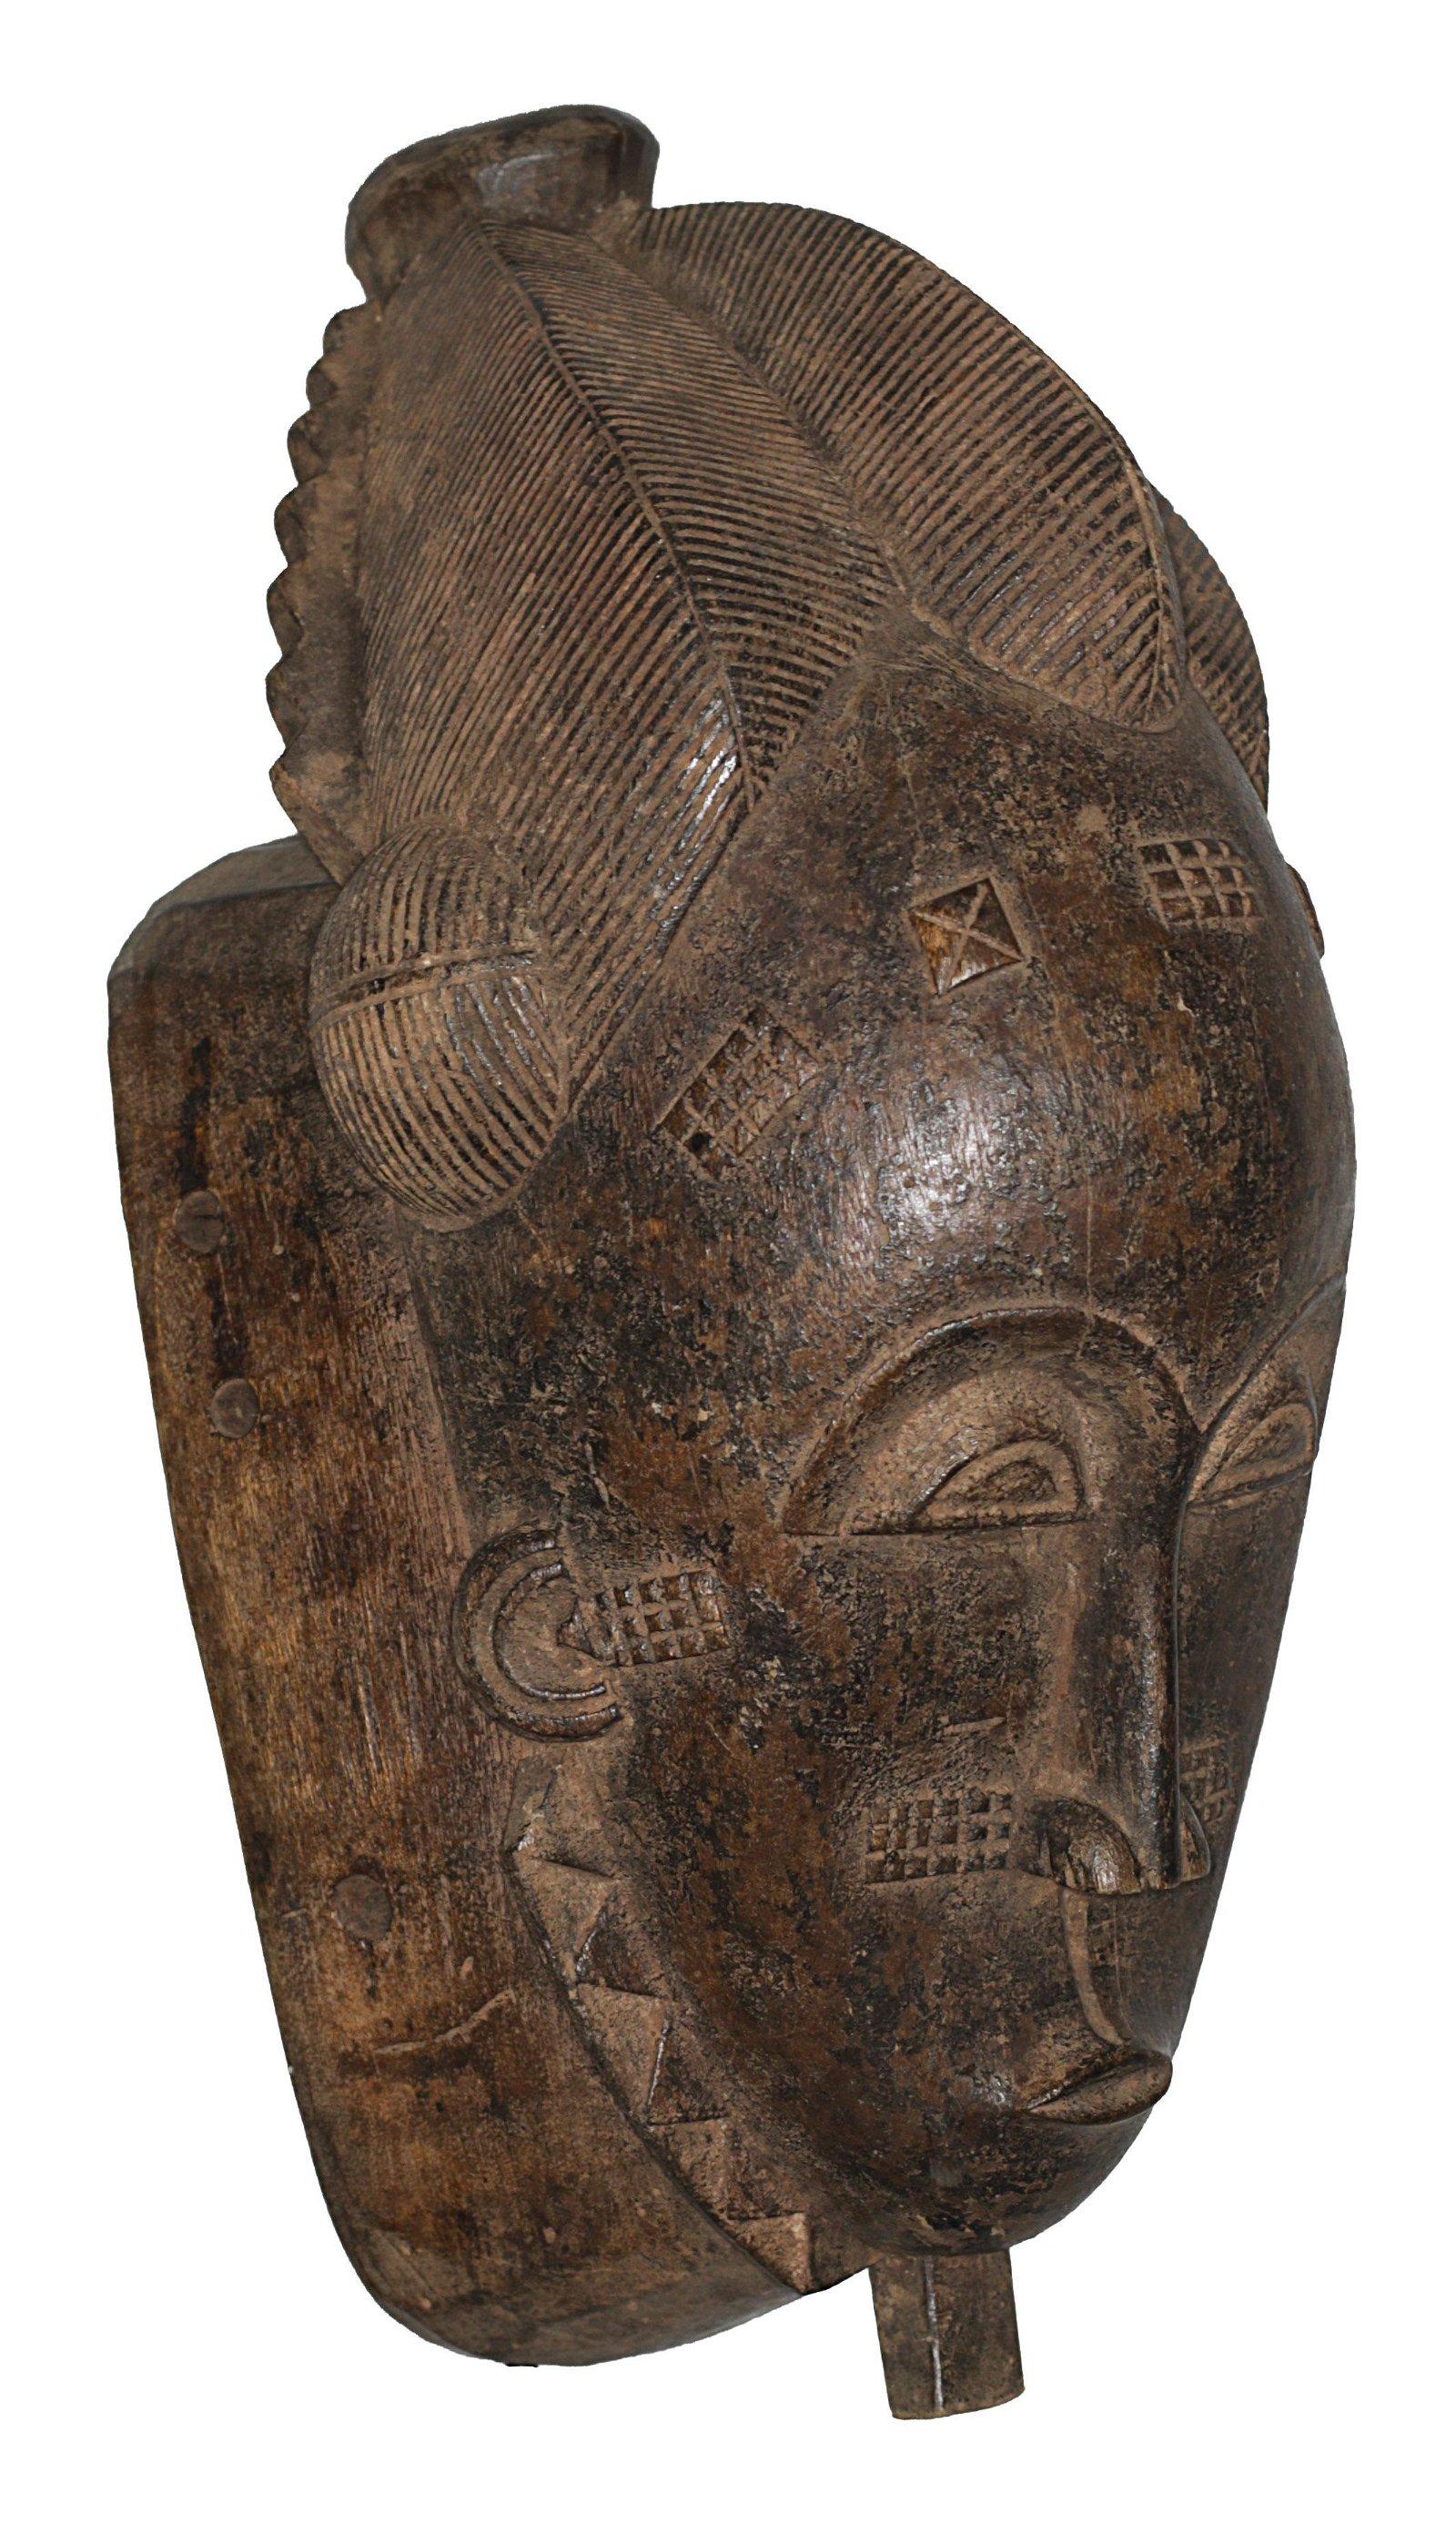 Ivory Coast Baule people Old and Impressive Ceremonial